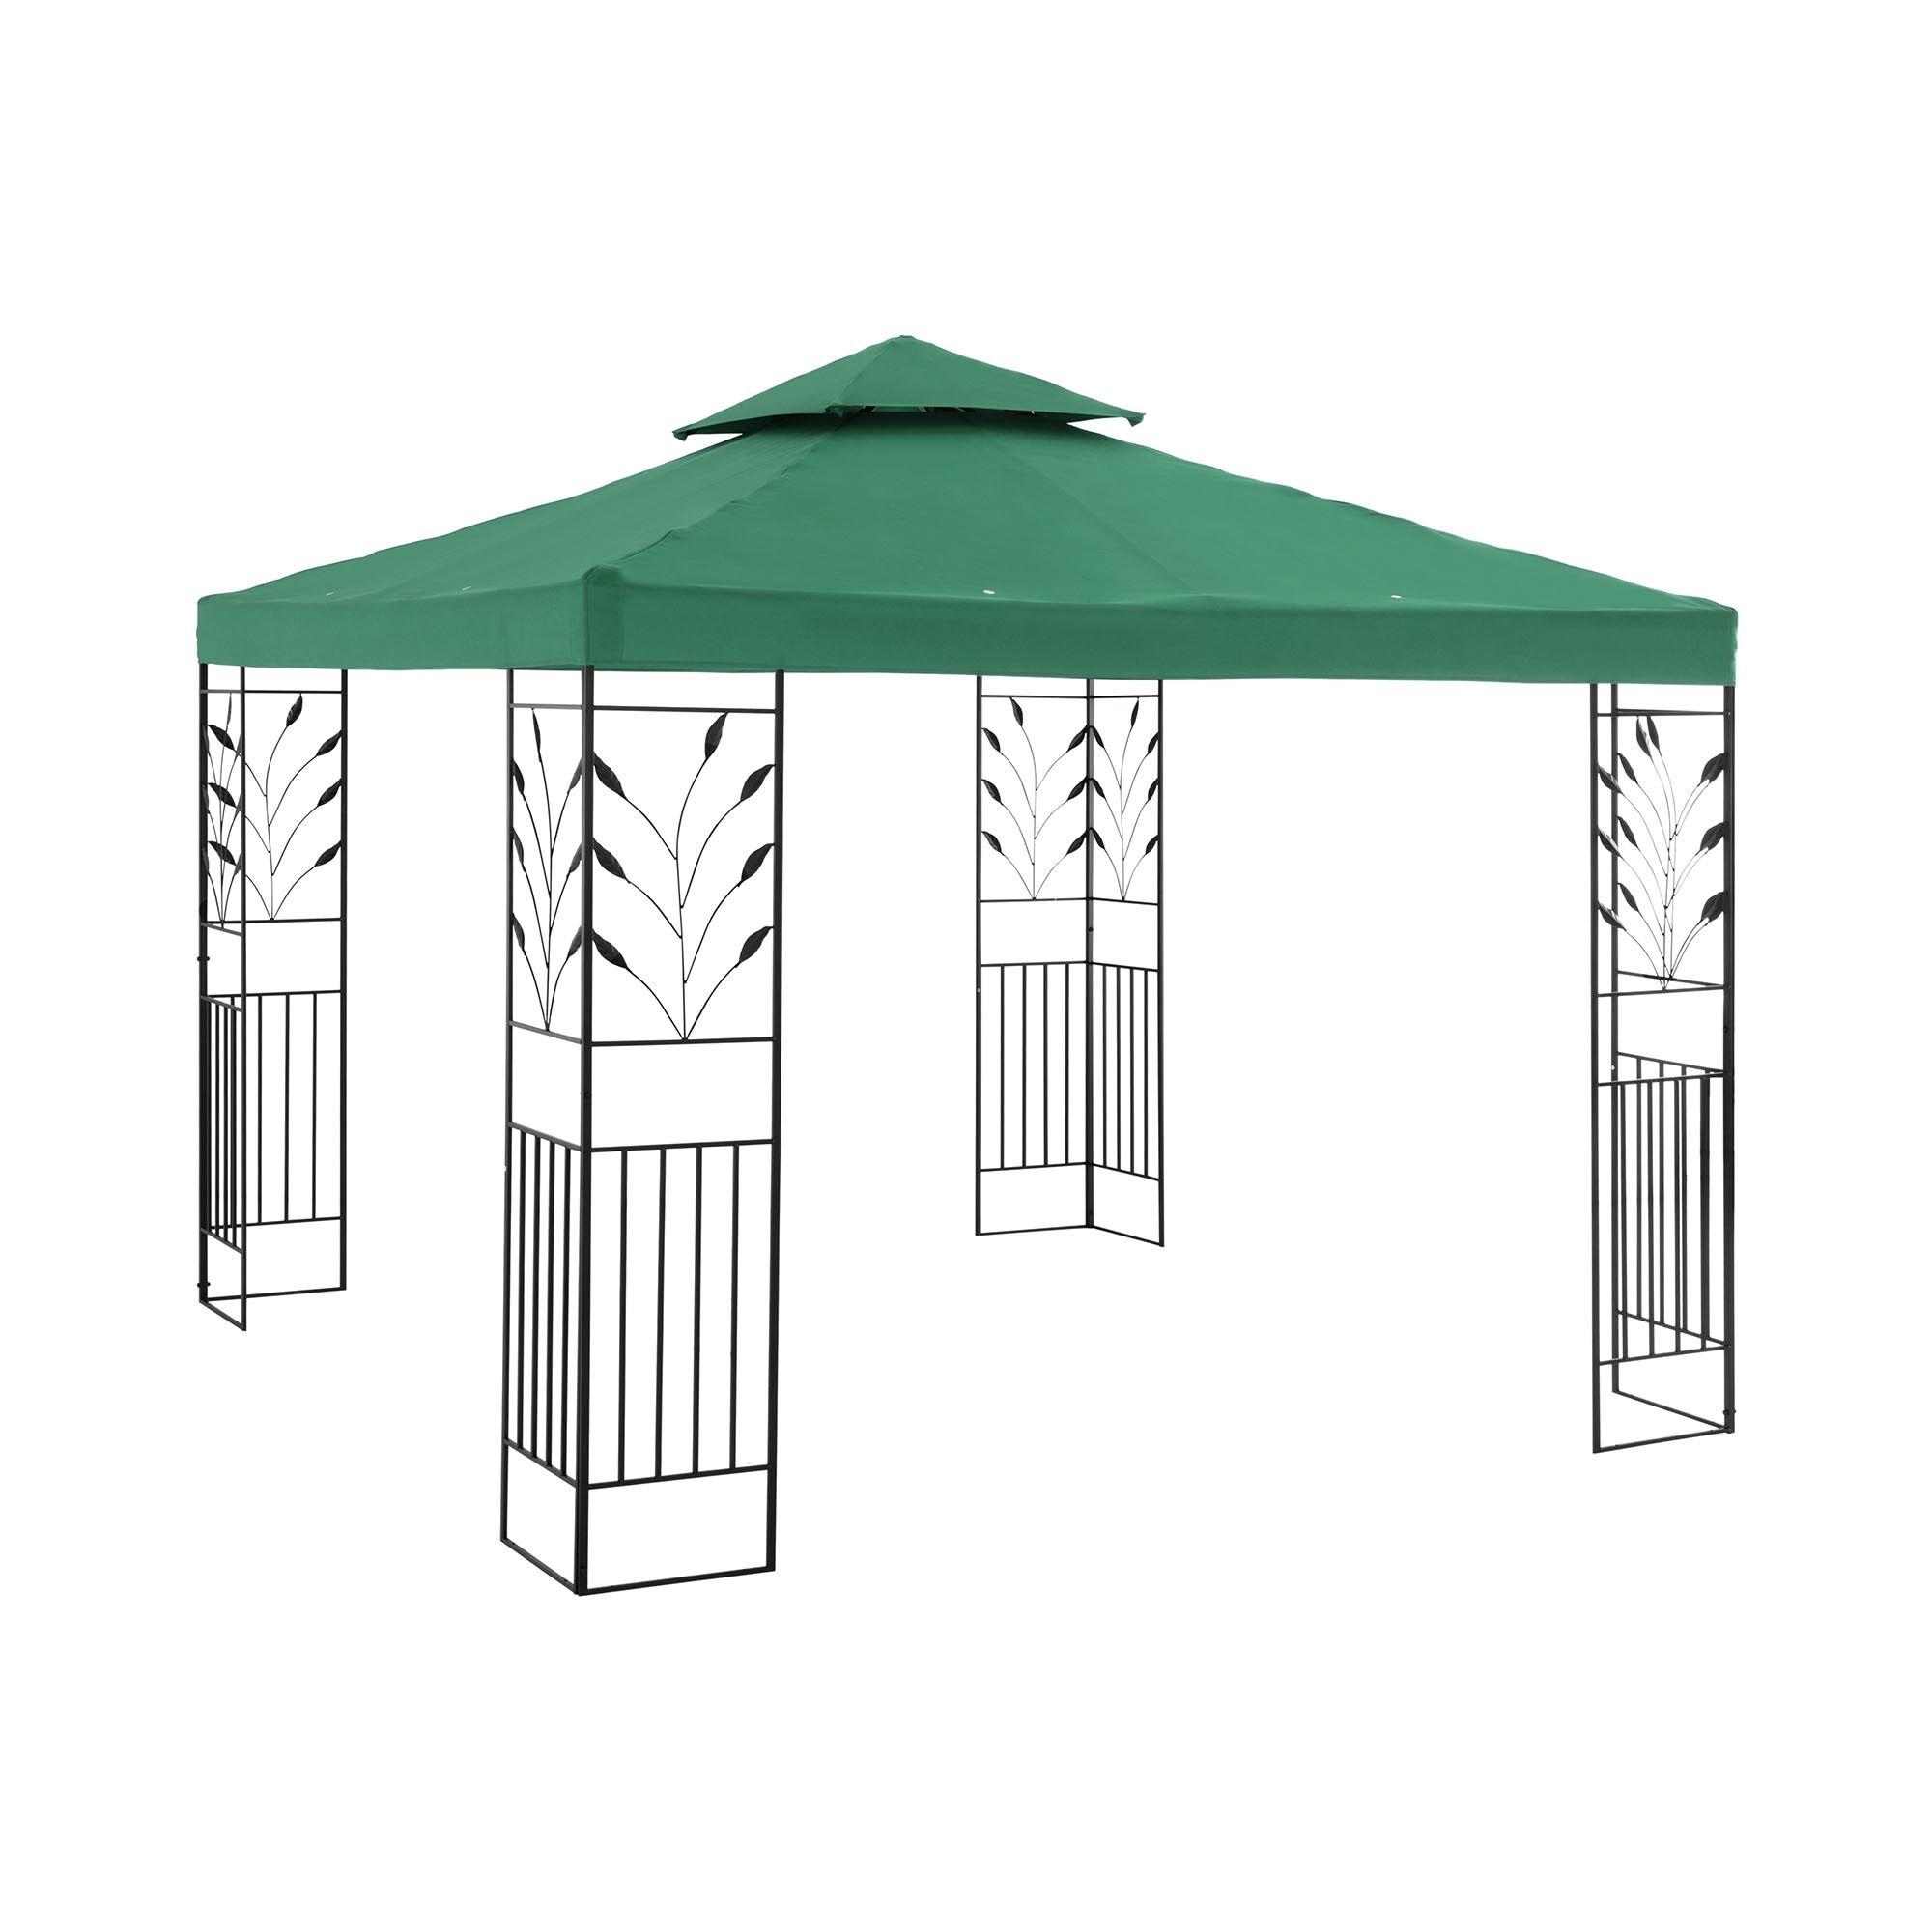 Uniprodo Gartenpavillon - 3 x 3 m - 180 g/m² - dunkelgrün UNI_PERGOLA_3X3G